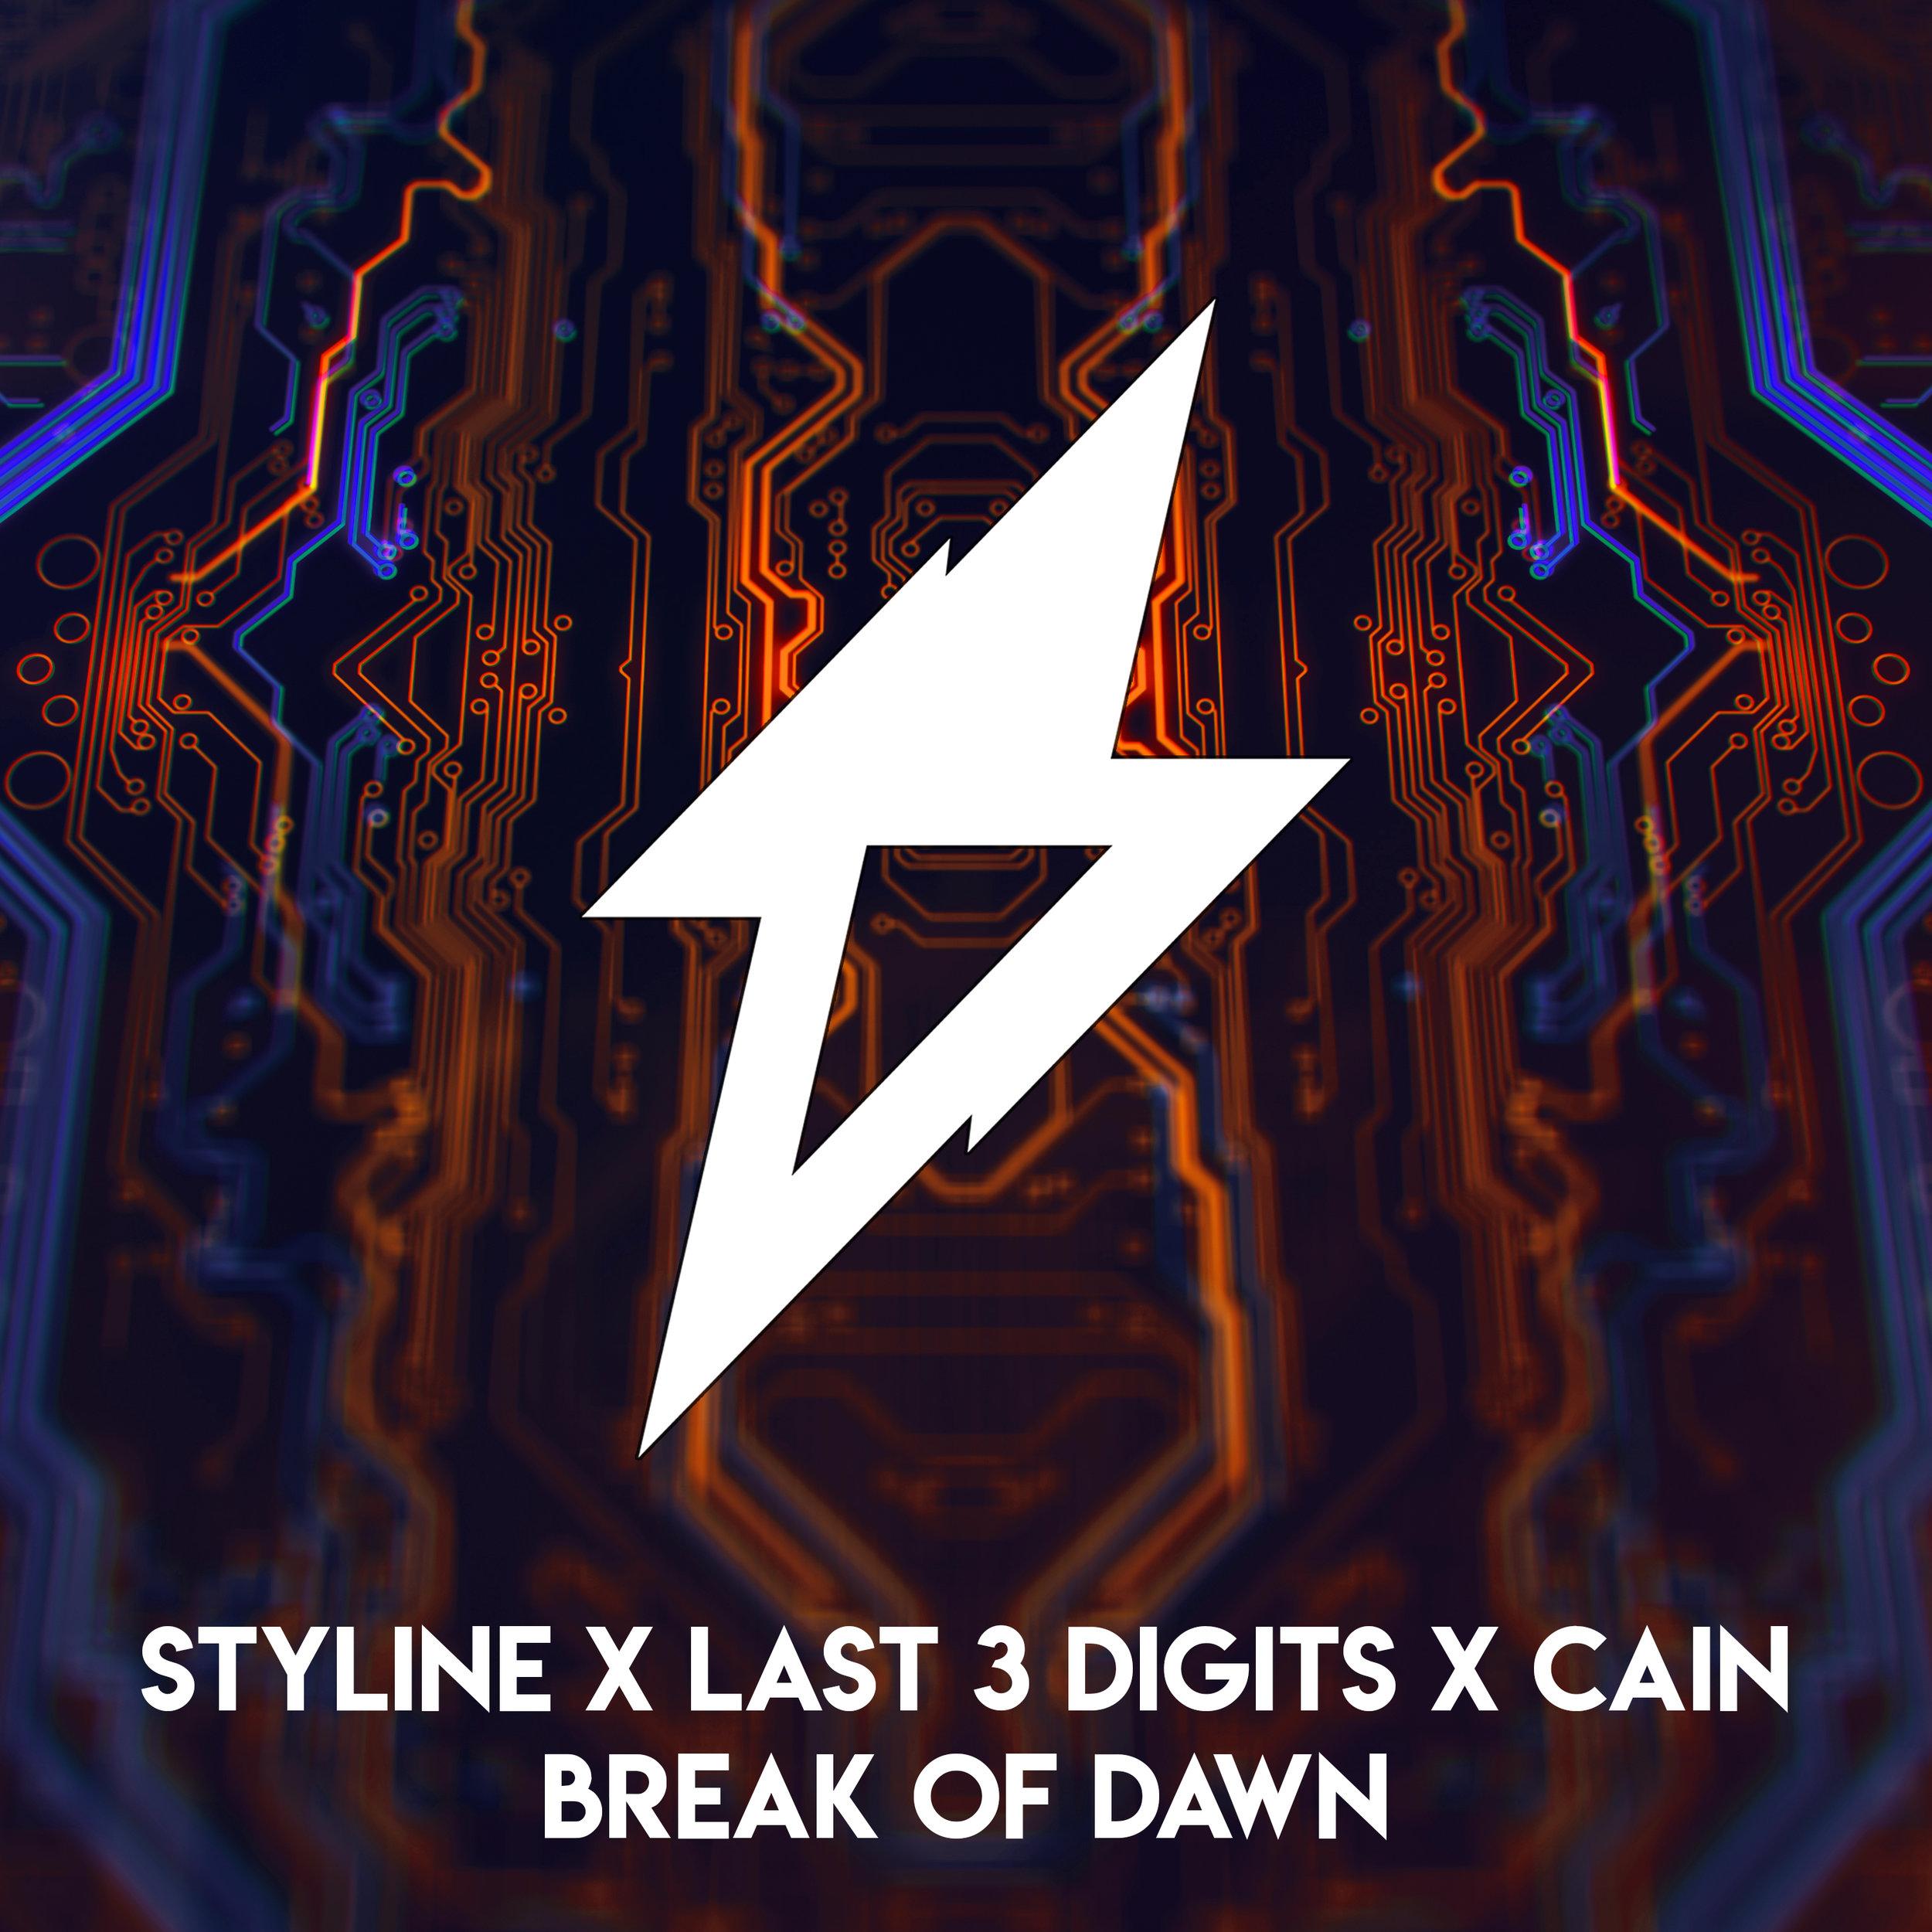 Styline X Last 3 Digits X CAIN - Break Of Dawn